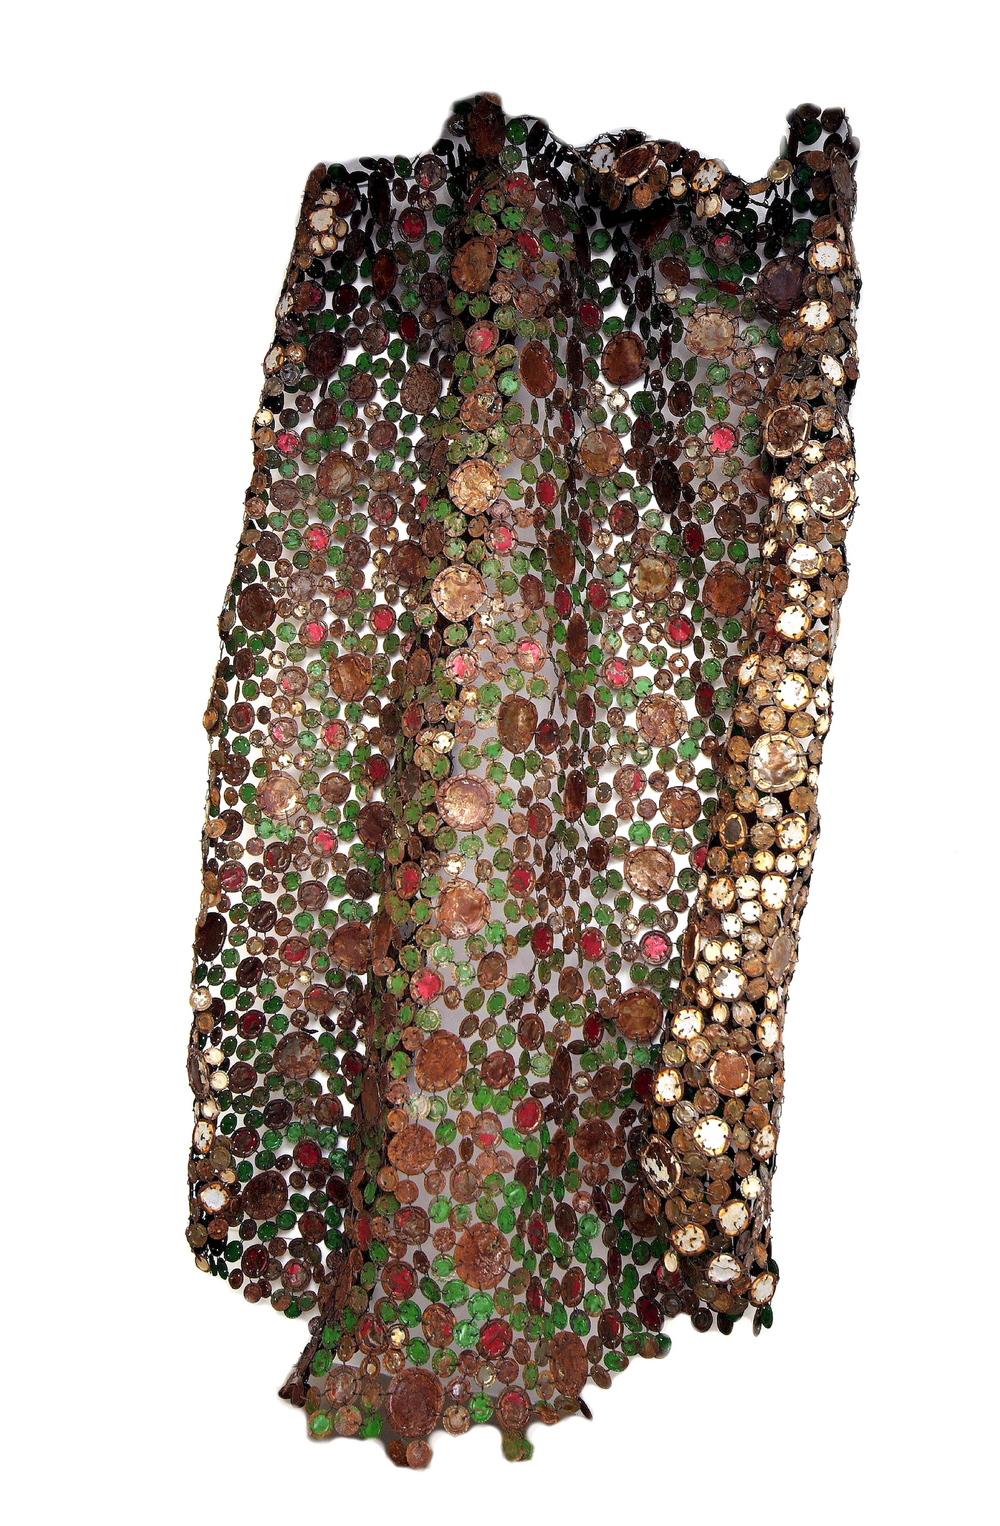 ARAZZO FANTASIA (2008) 220x210cm - ARAZZO SUZANI (2009) 300x200cm